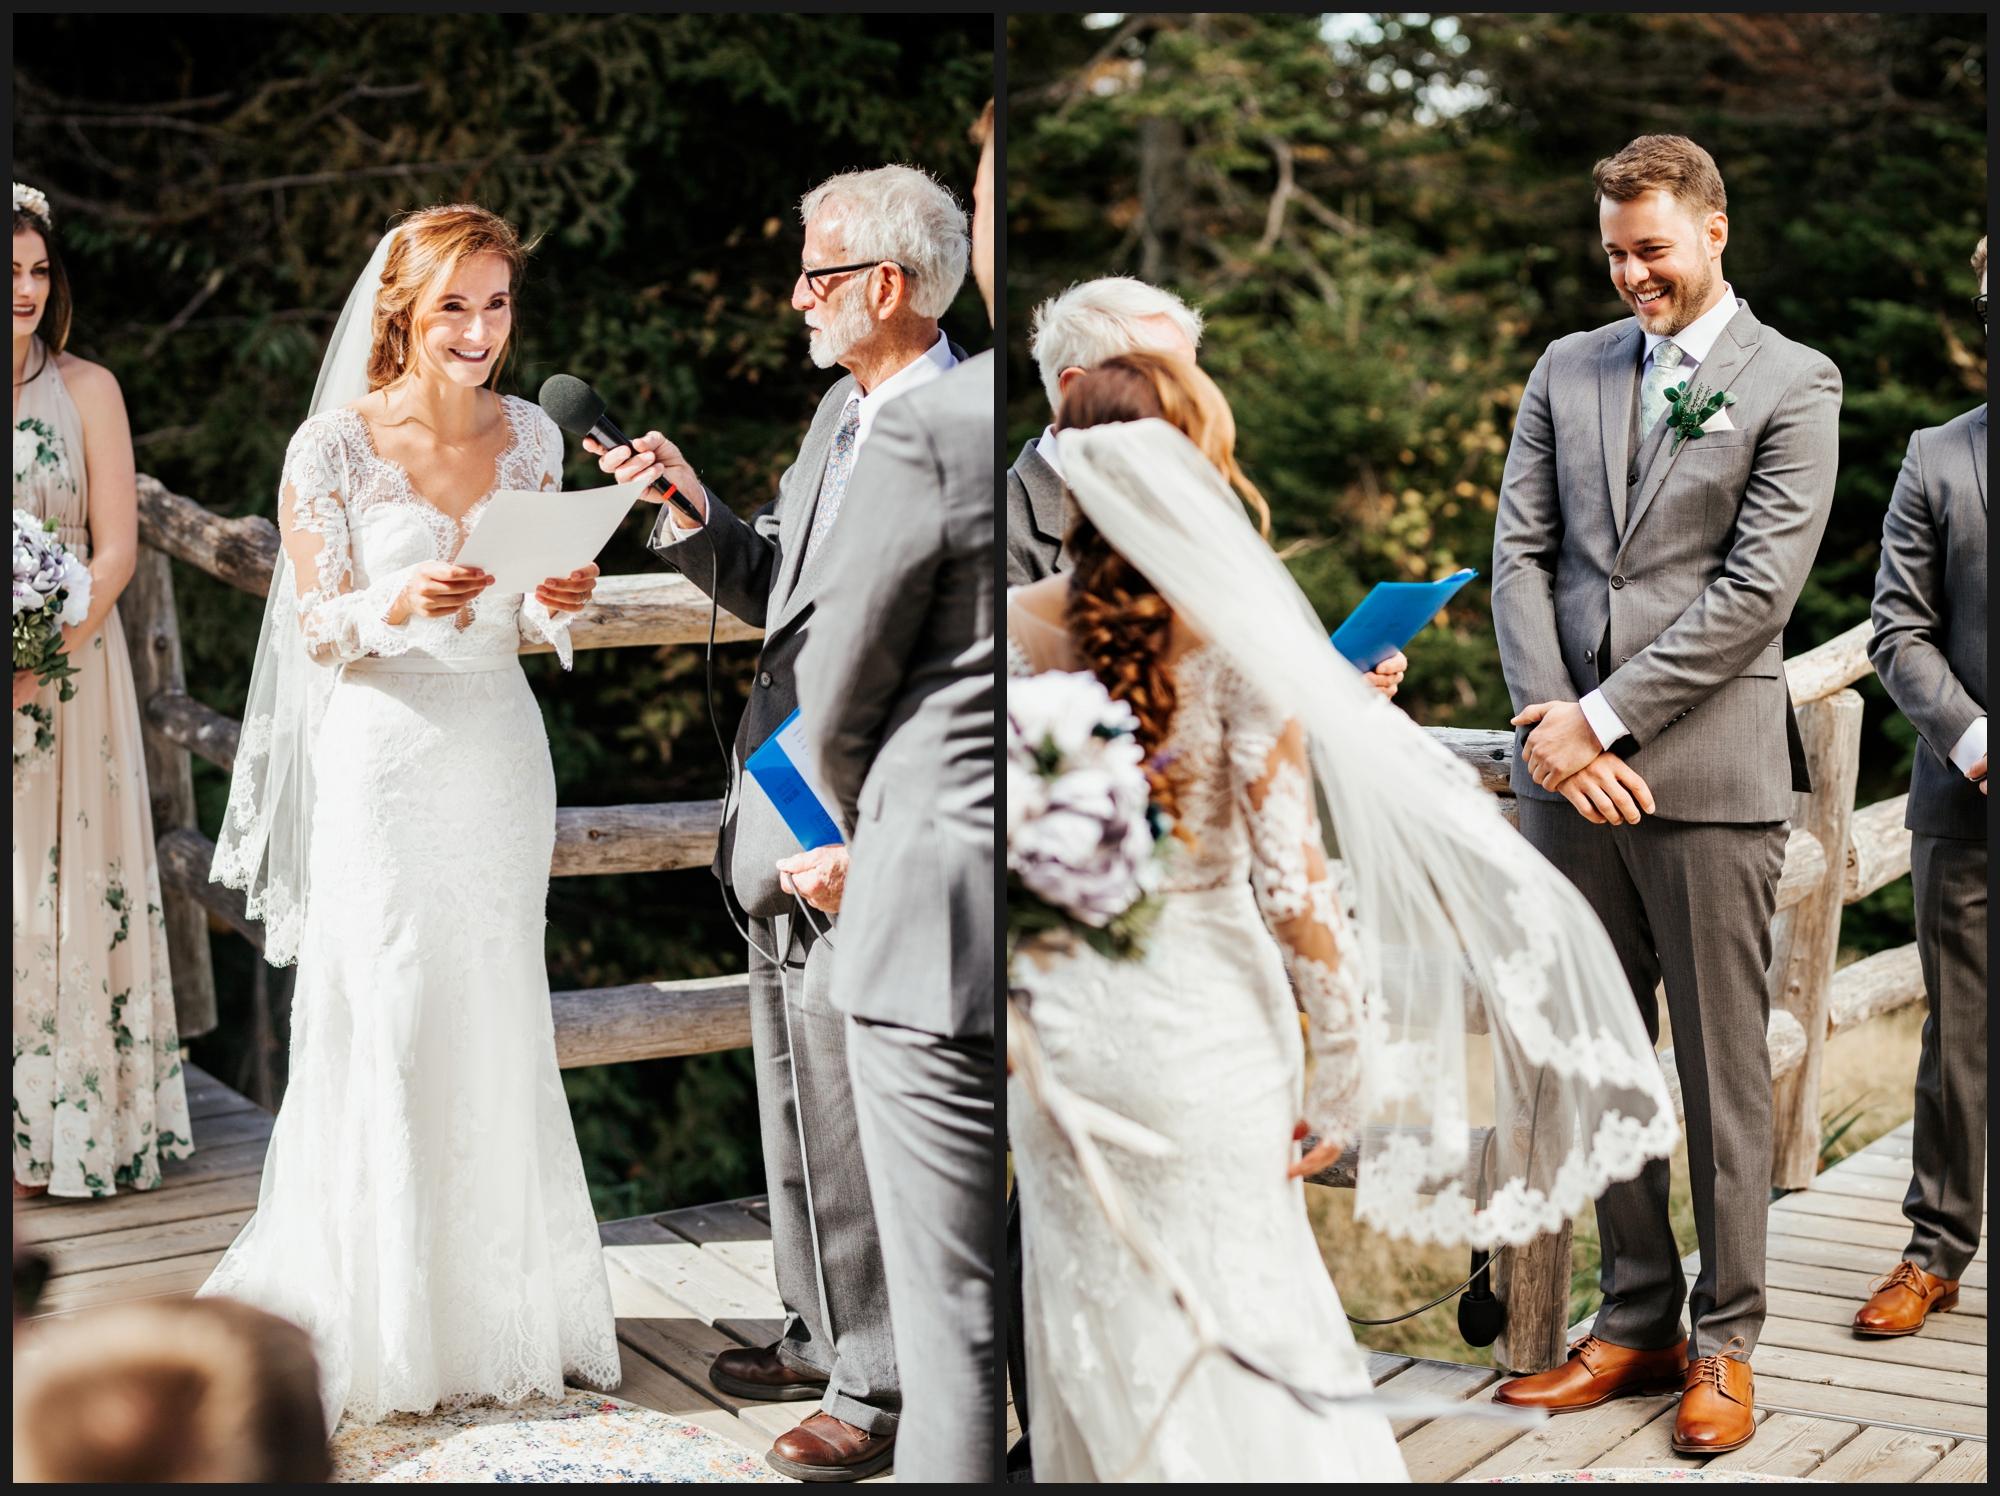 Orlando-Wedding-Photographer-destination-wedding-photographer-florida-wedding-photographer-hawaii-wedding-photographer_0105.jpg